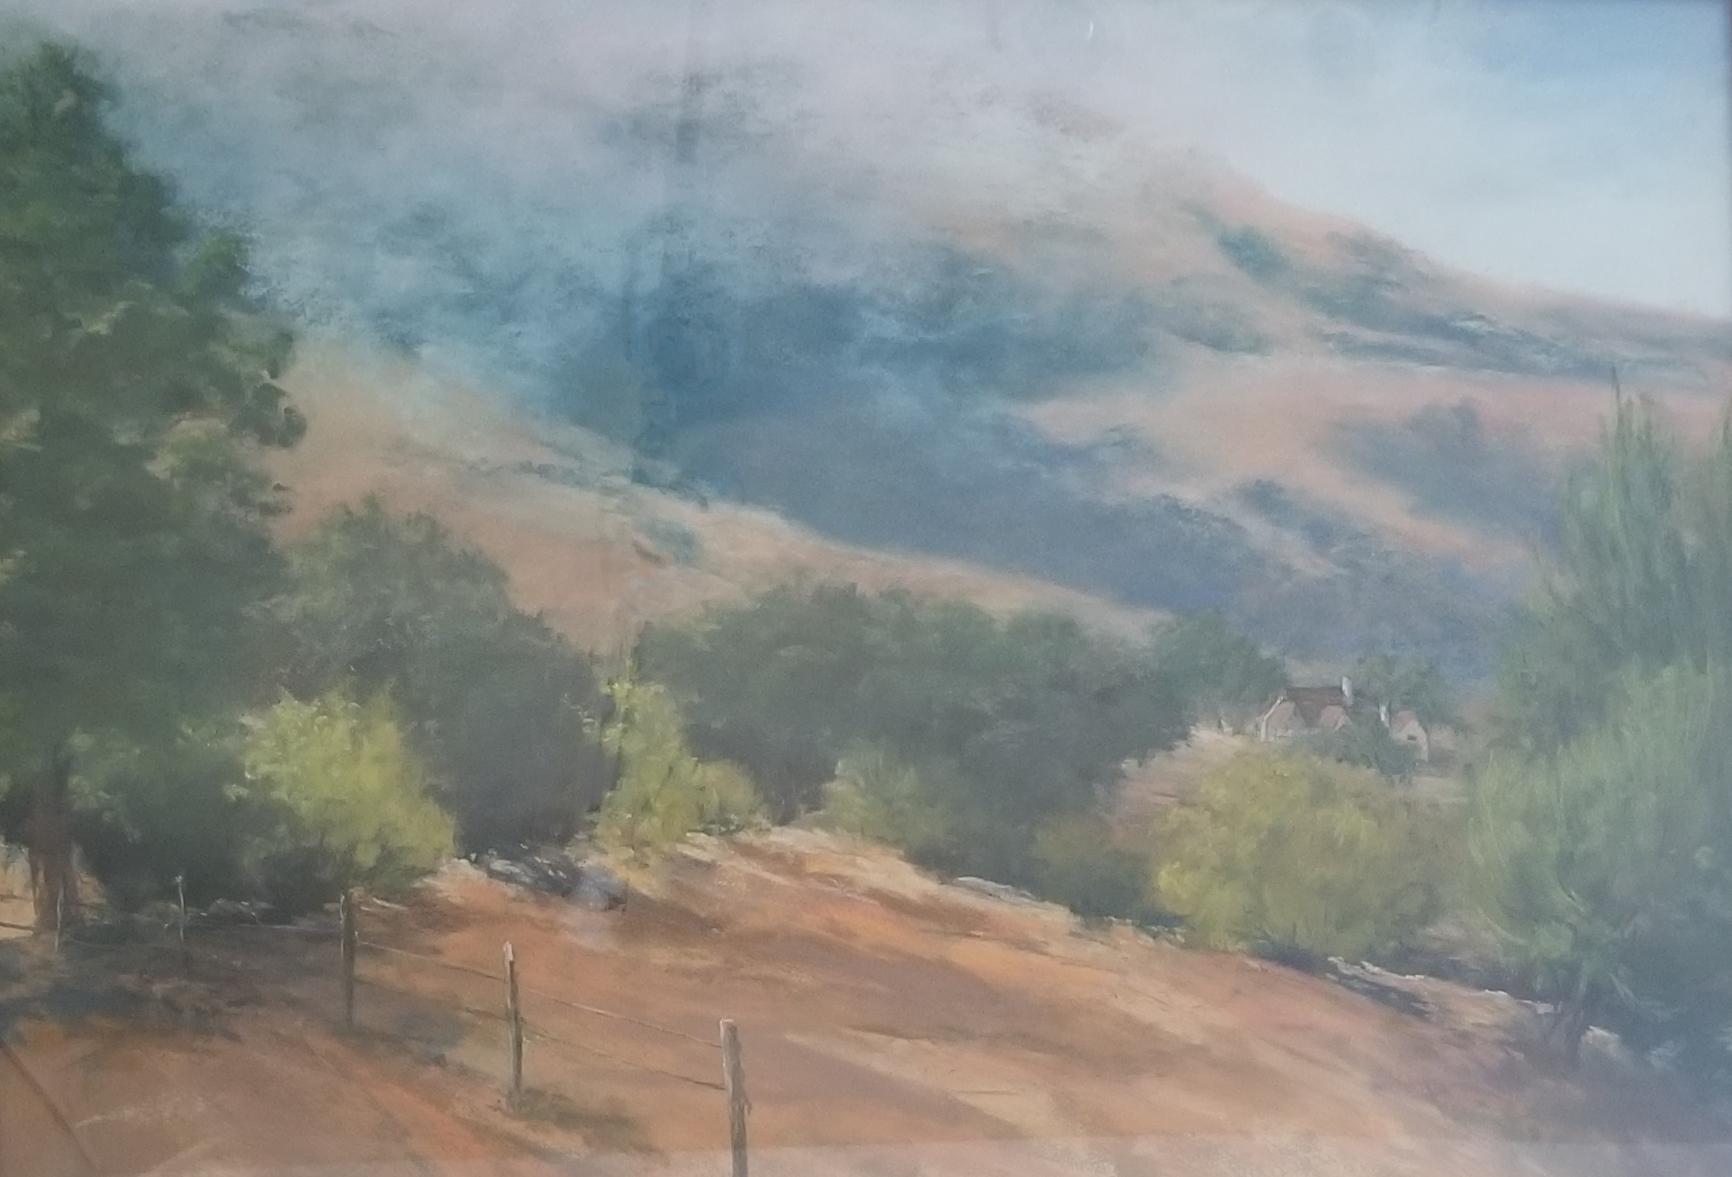 Morning Mist, Roswitha Kress, 23 x 29, pastel on board, $500